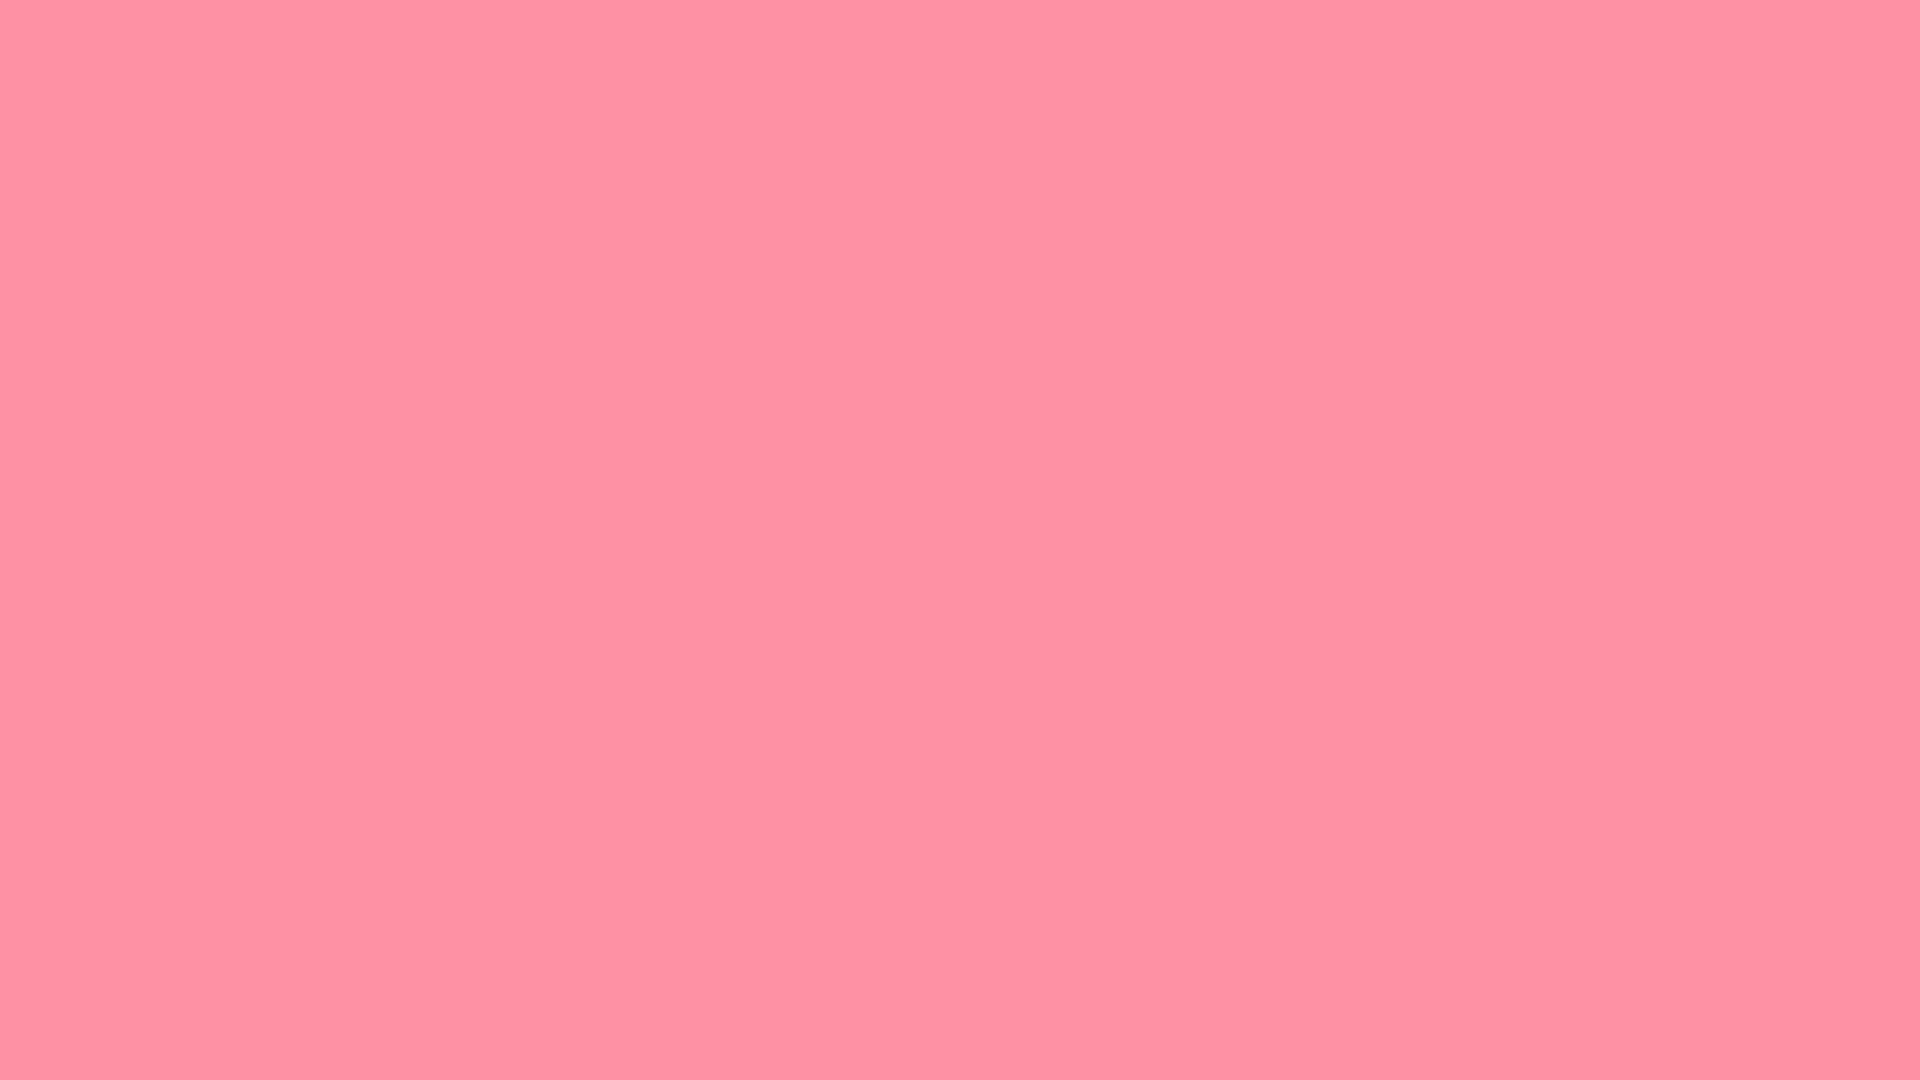 Salmon Pink   Wallpaper High Definition High Quality Widescreen 1920x1080